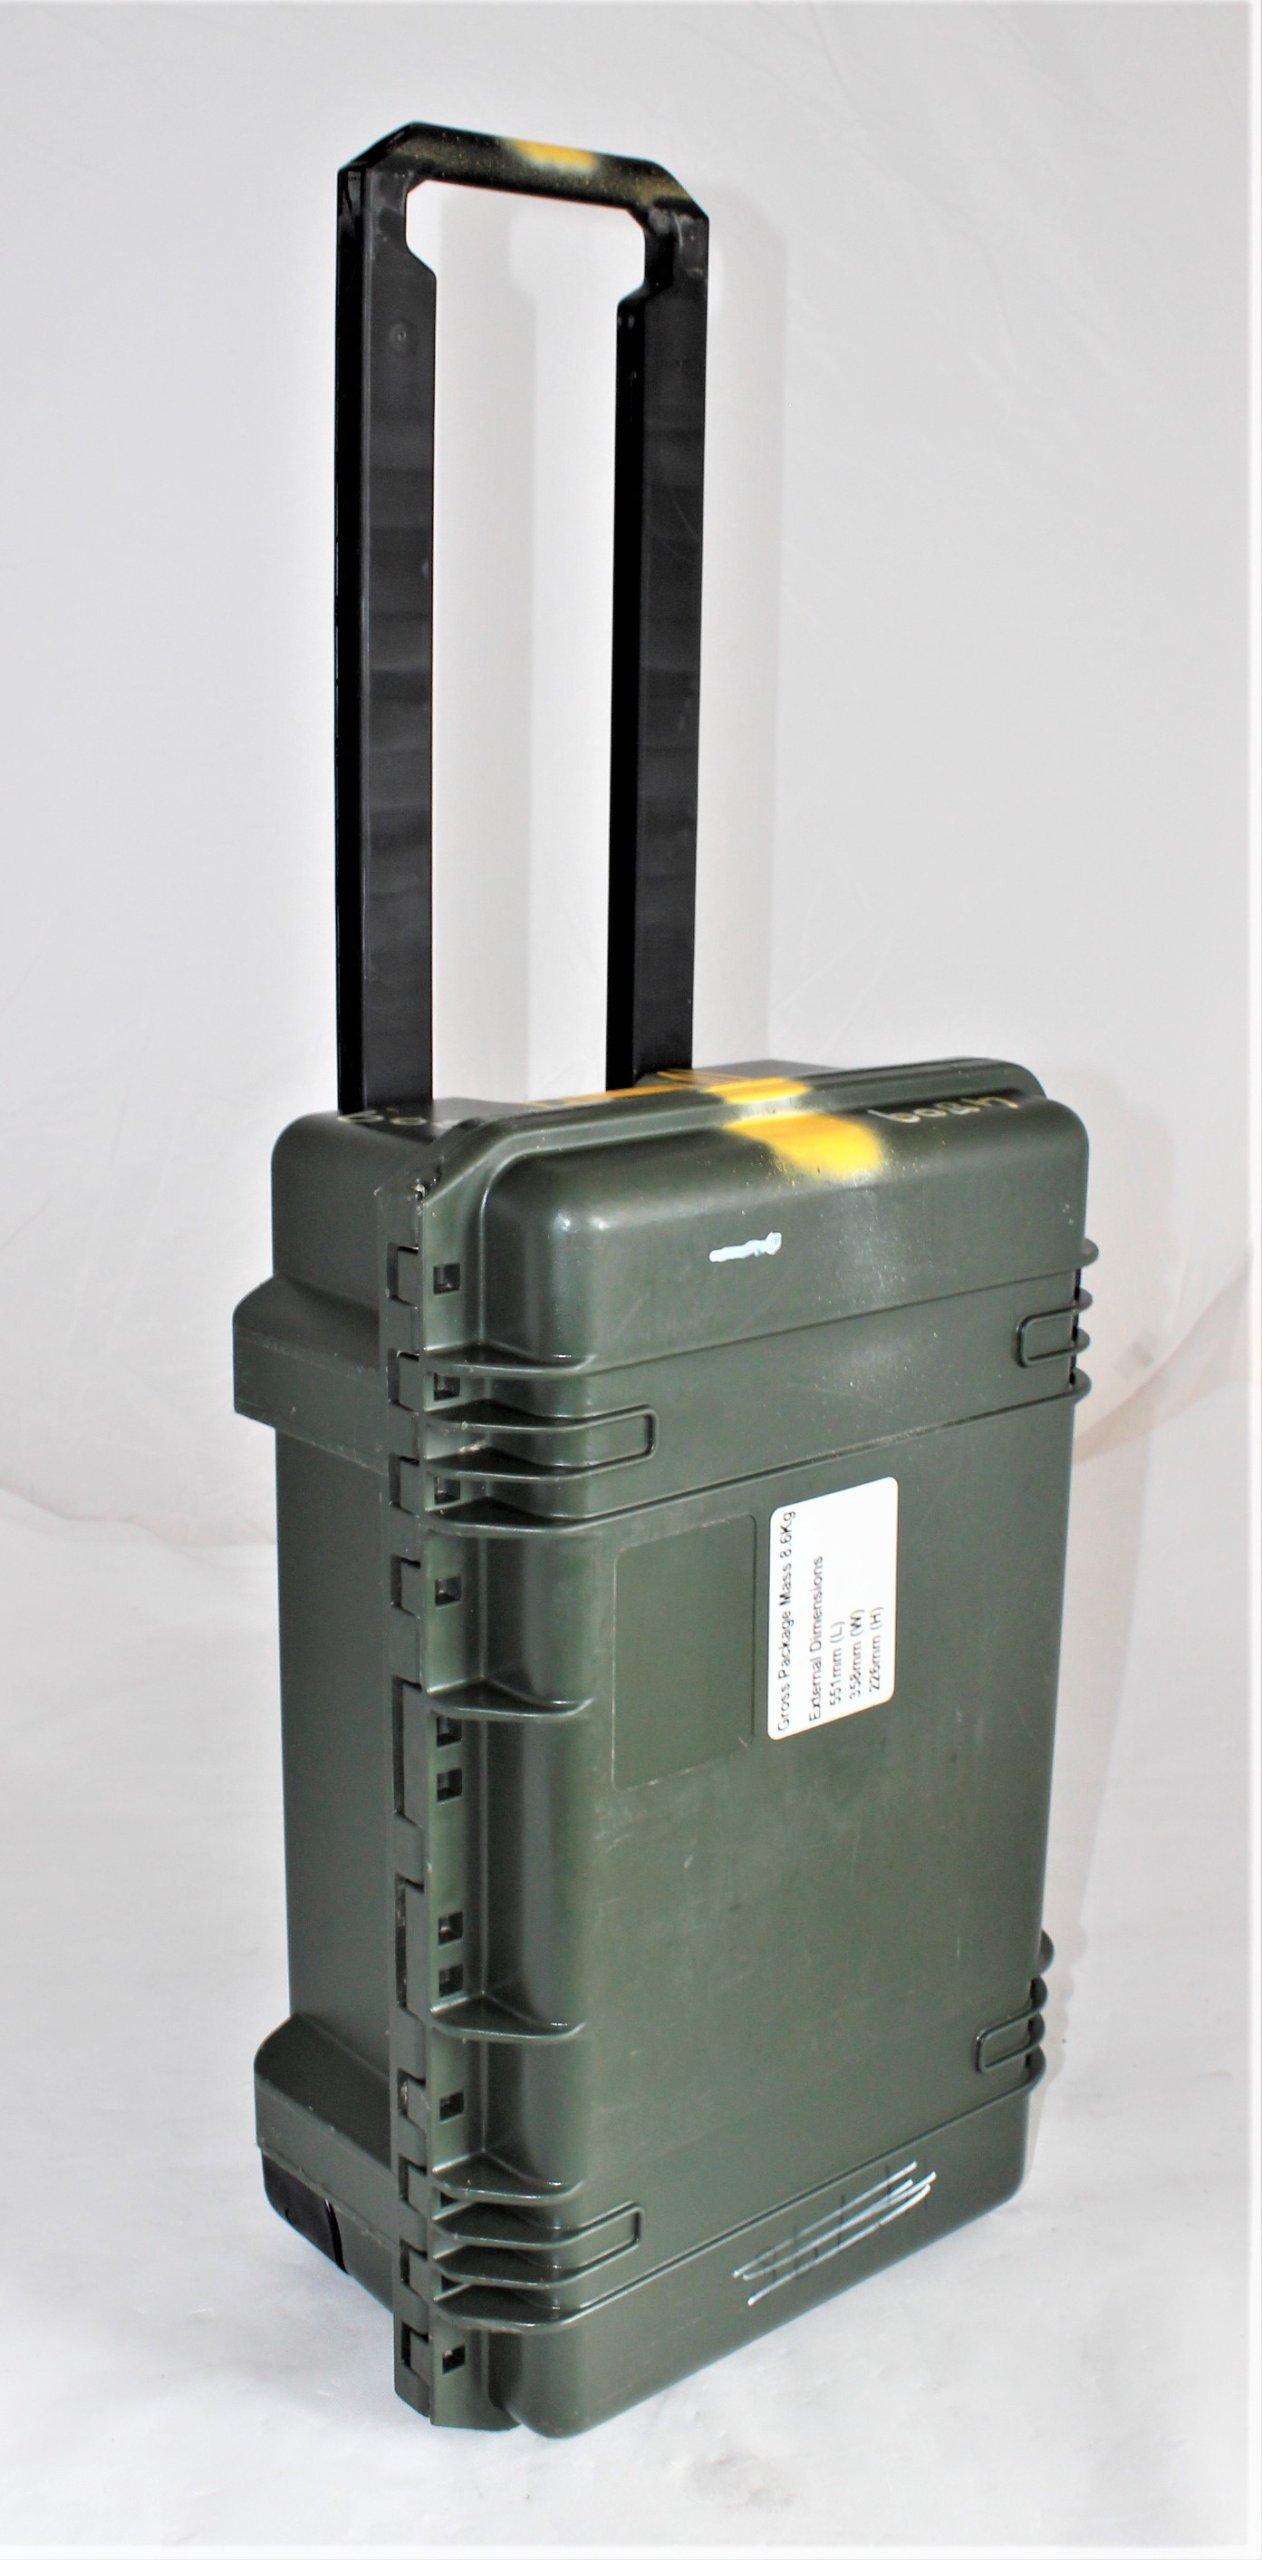 0209c834d7145 Walizka podręczna na bagaż PELI STORM CASE iM2500 - 7088124277 ...